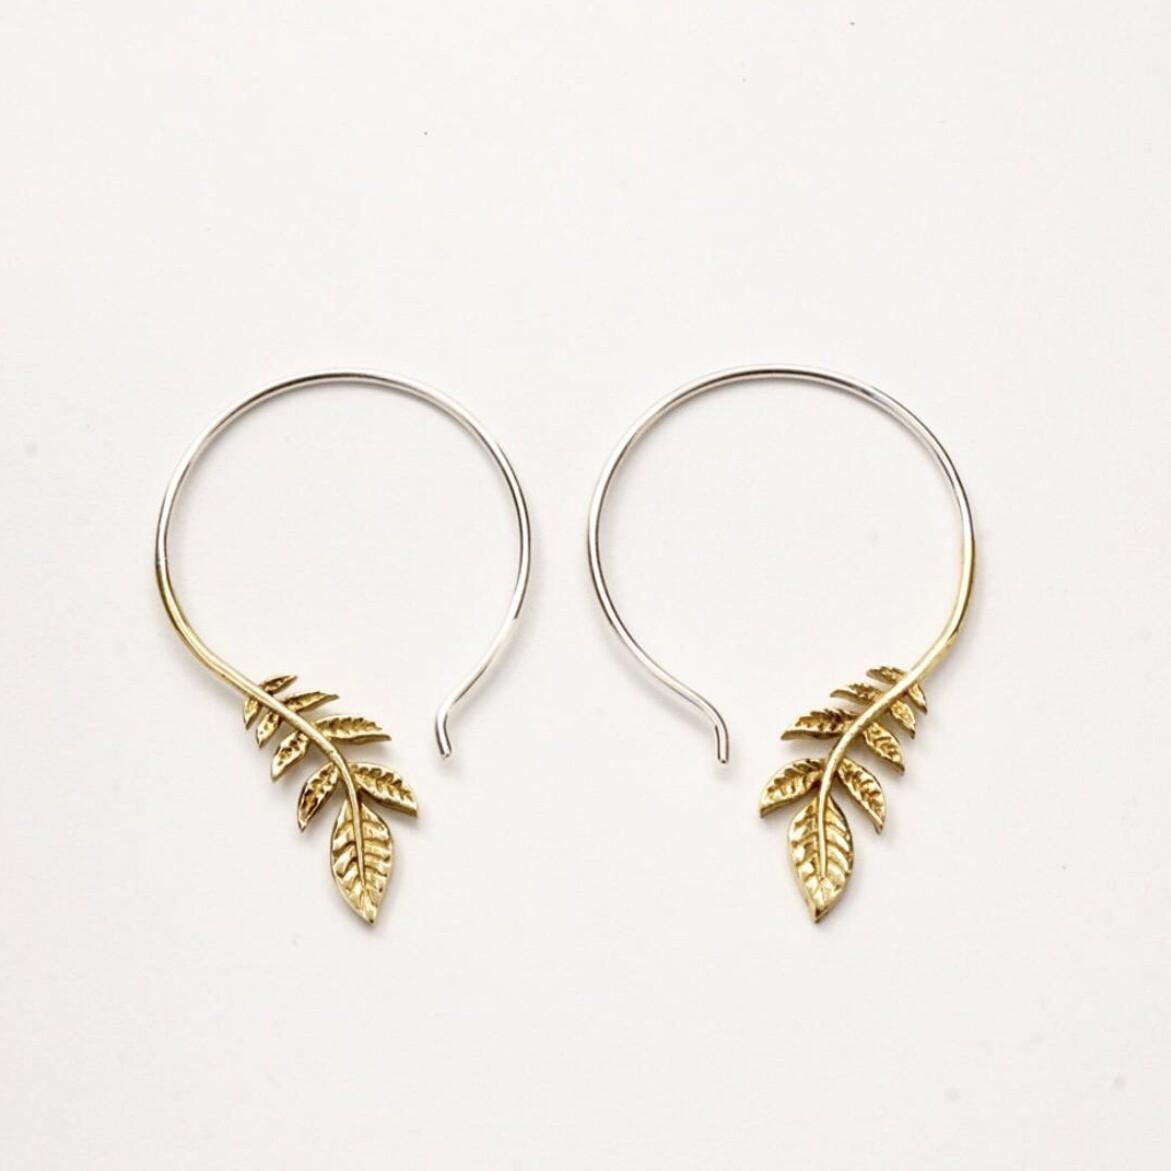 Olive Leaf Hoop Earrings in Brass + Sterling Silver - IBE136